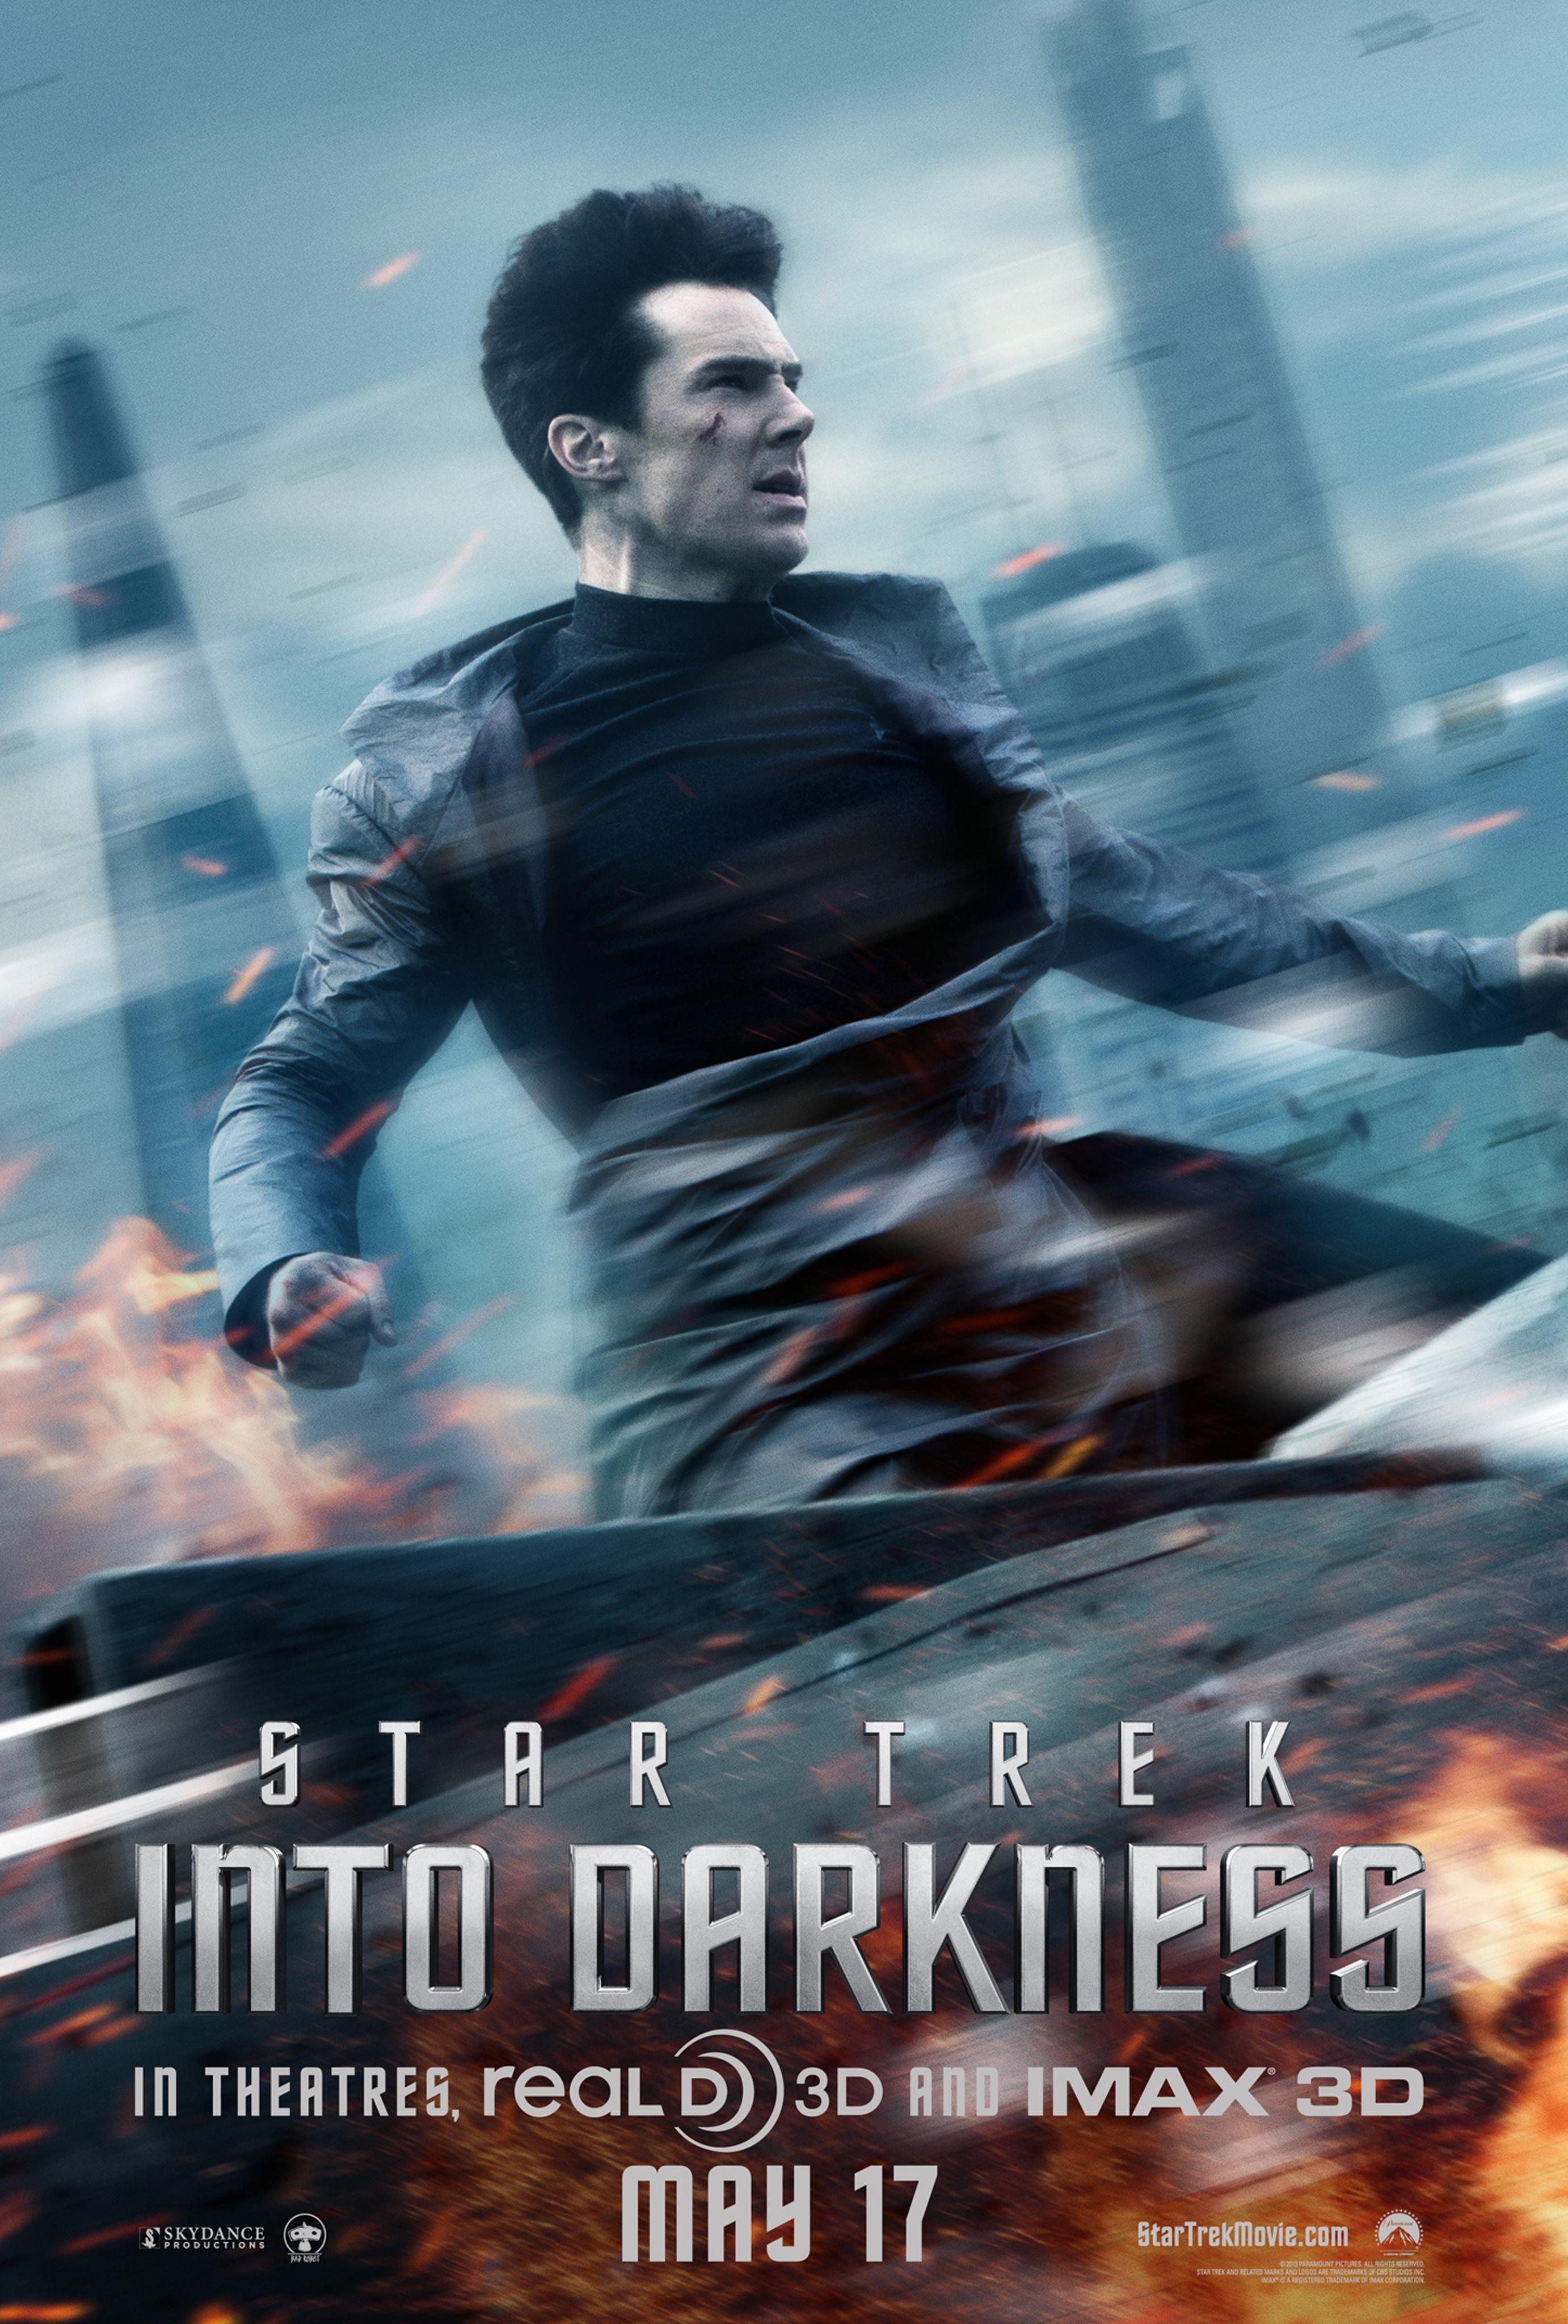 Star Trek Into Darkness - Movie Poster #4 (Original)